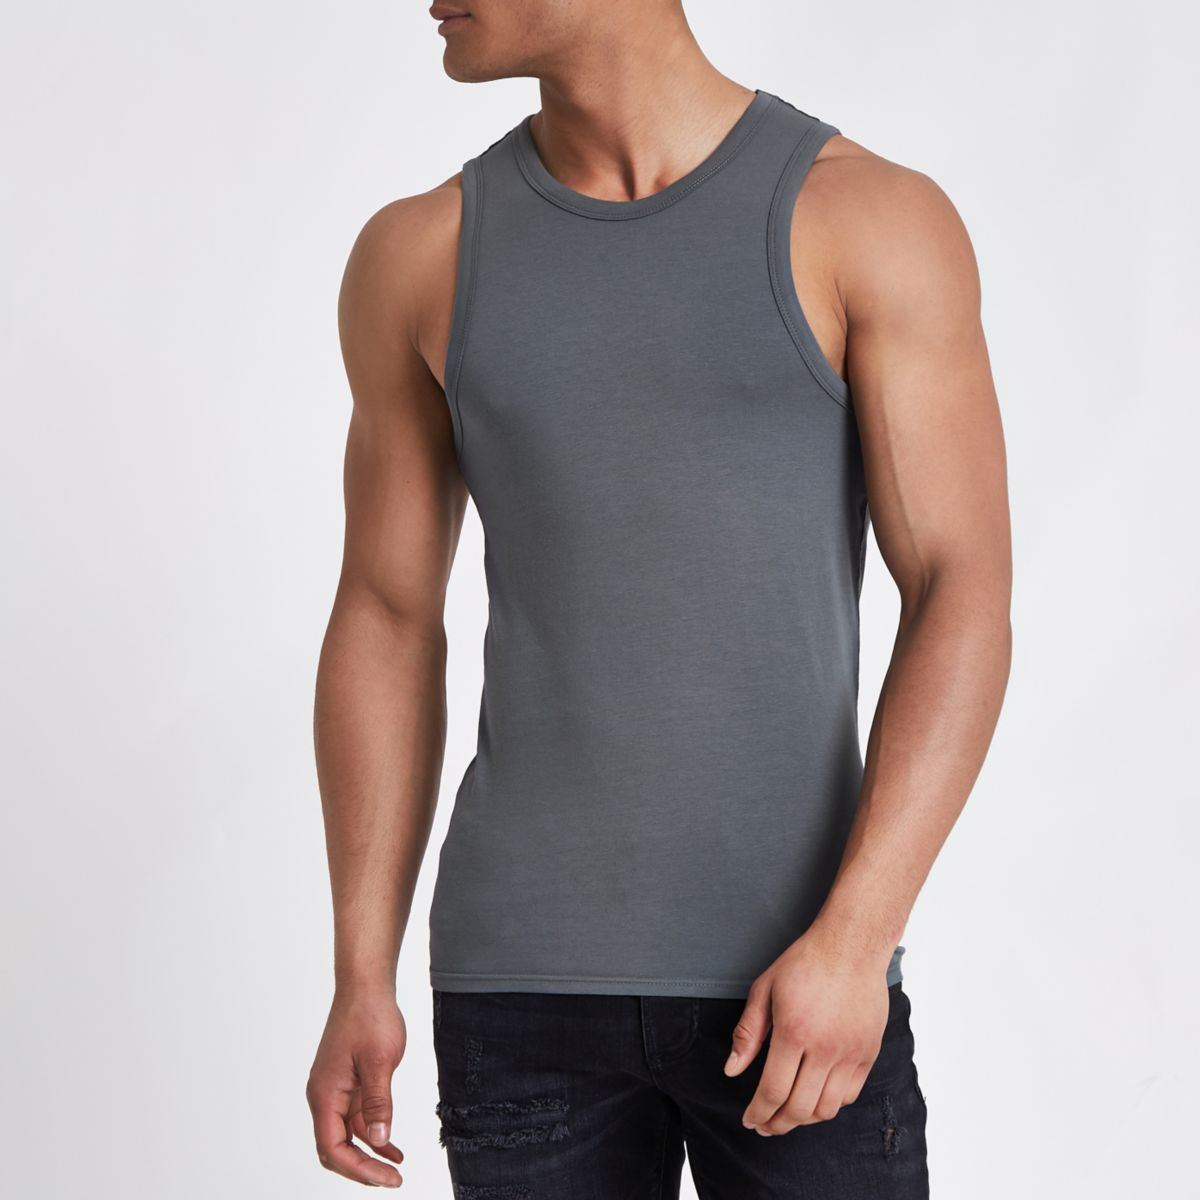 Dark grey muscle fit vest top